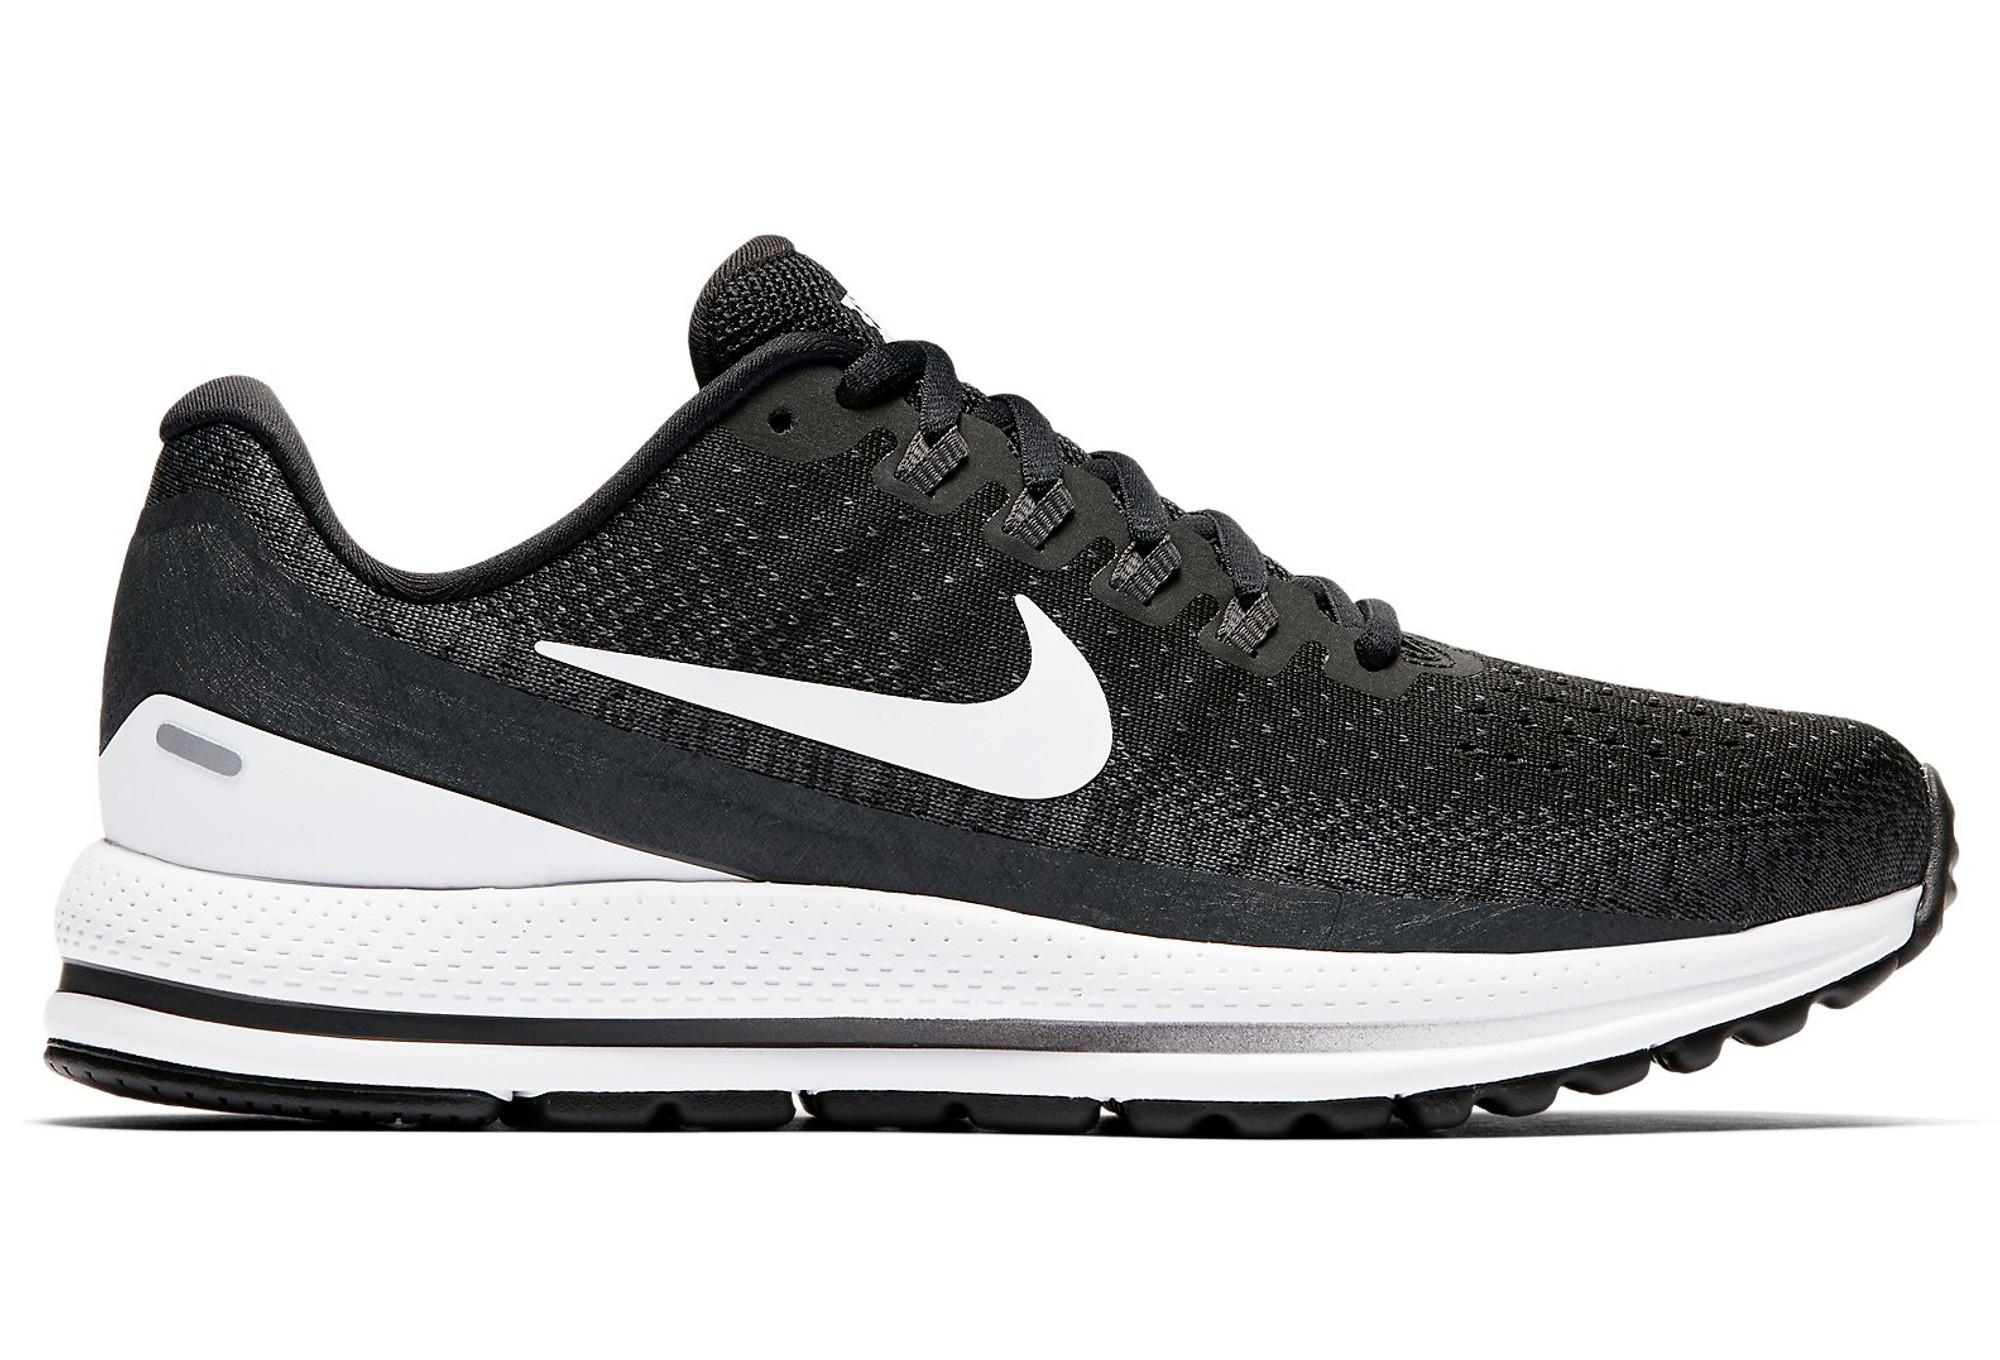 finest selection ceb12 8c8af Chaussures de Running Femme Nike Air Zoom Vomero 13 Noir   Blanc